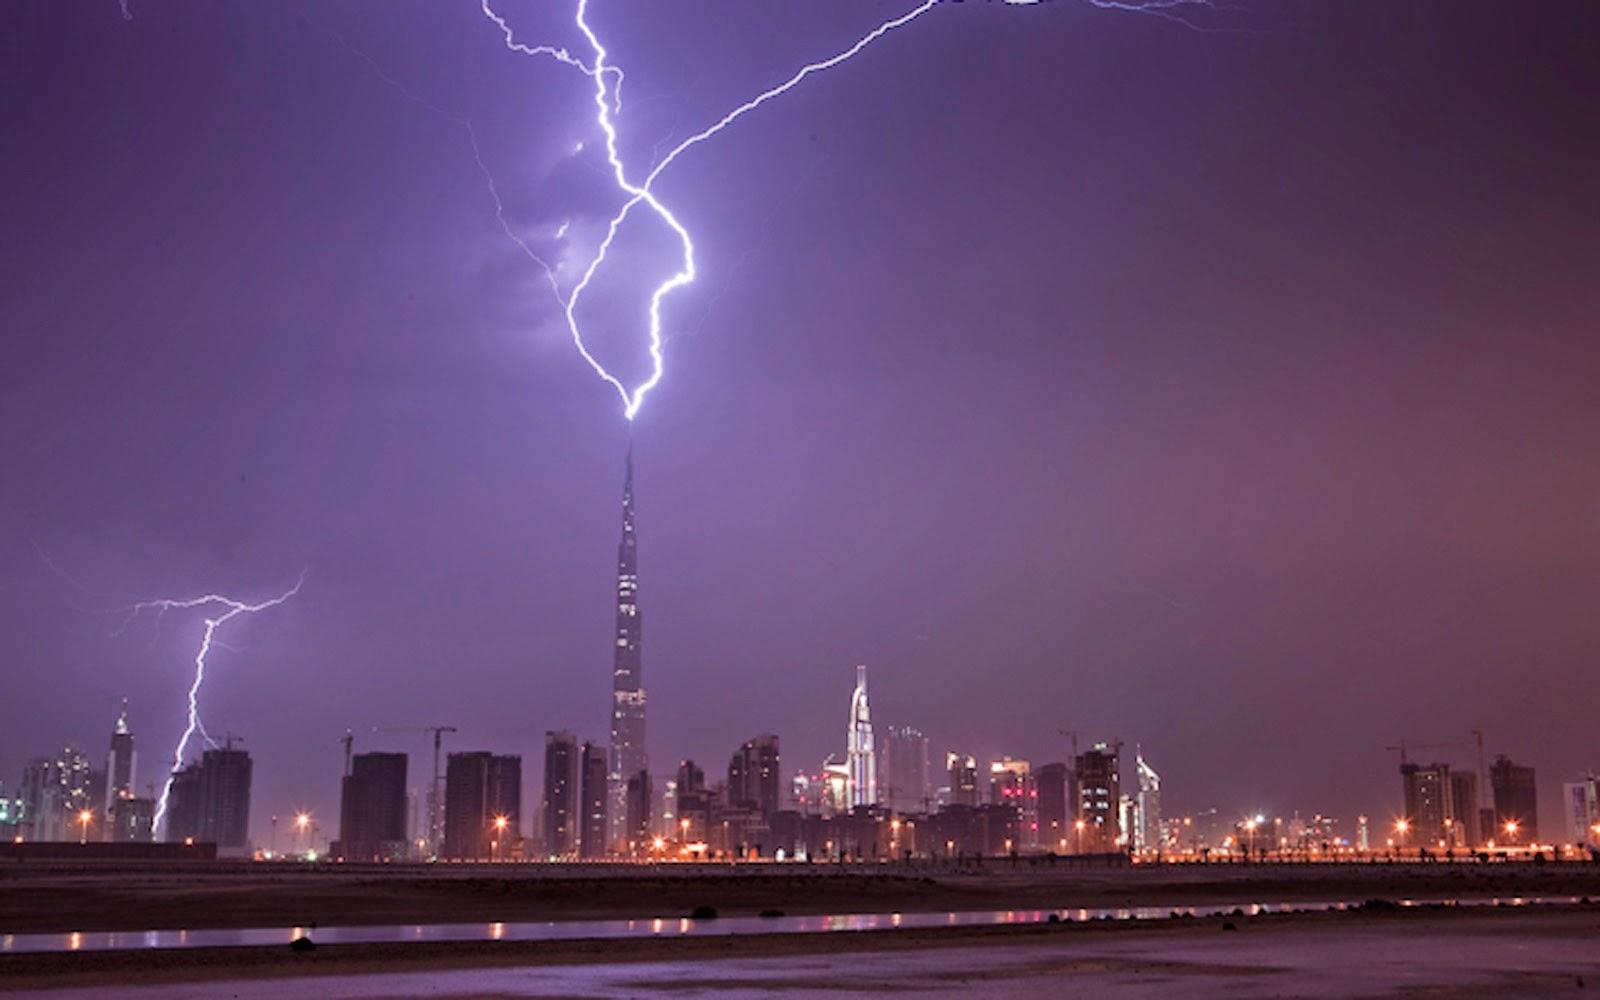 Burj Khalifa Hd Photos: HD Wallpapers: Burj Khalifa Photos At Night